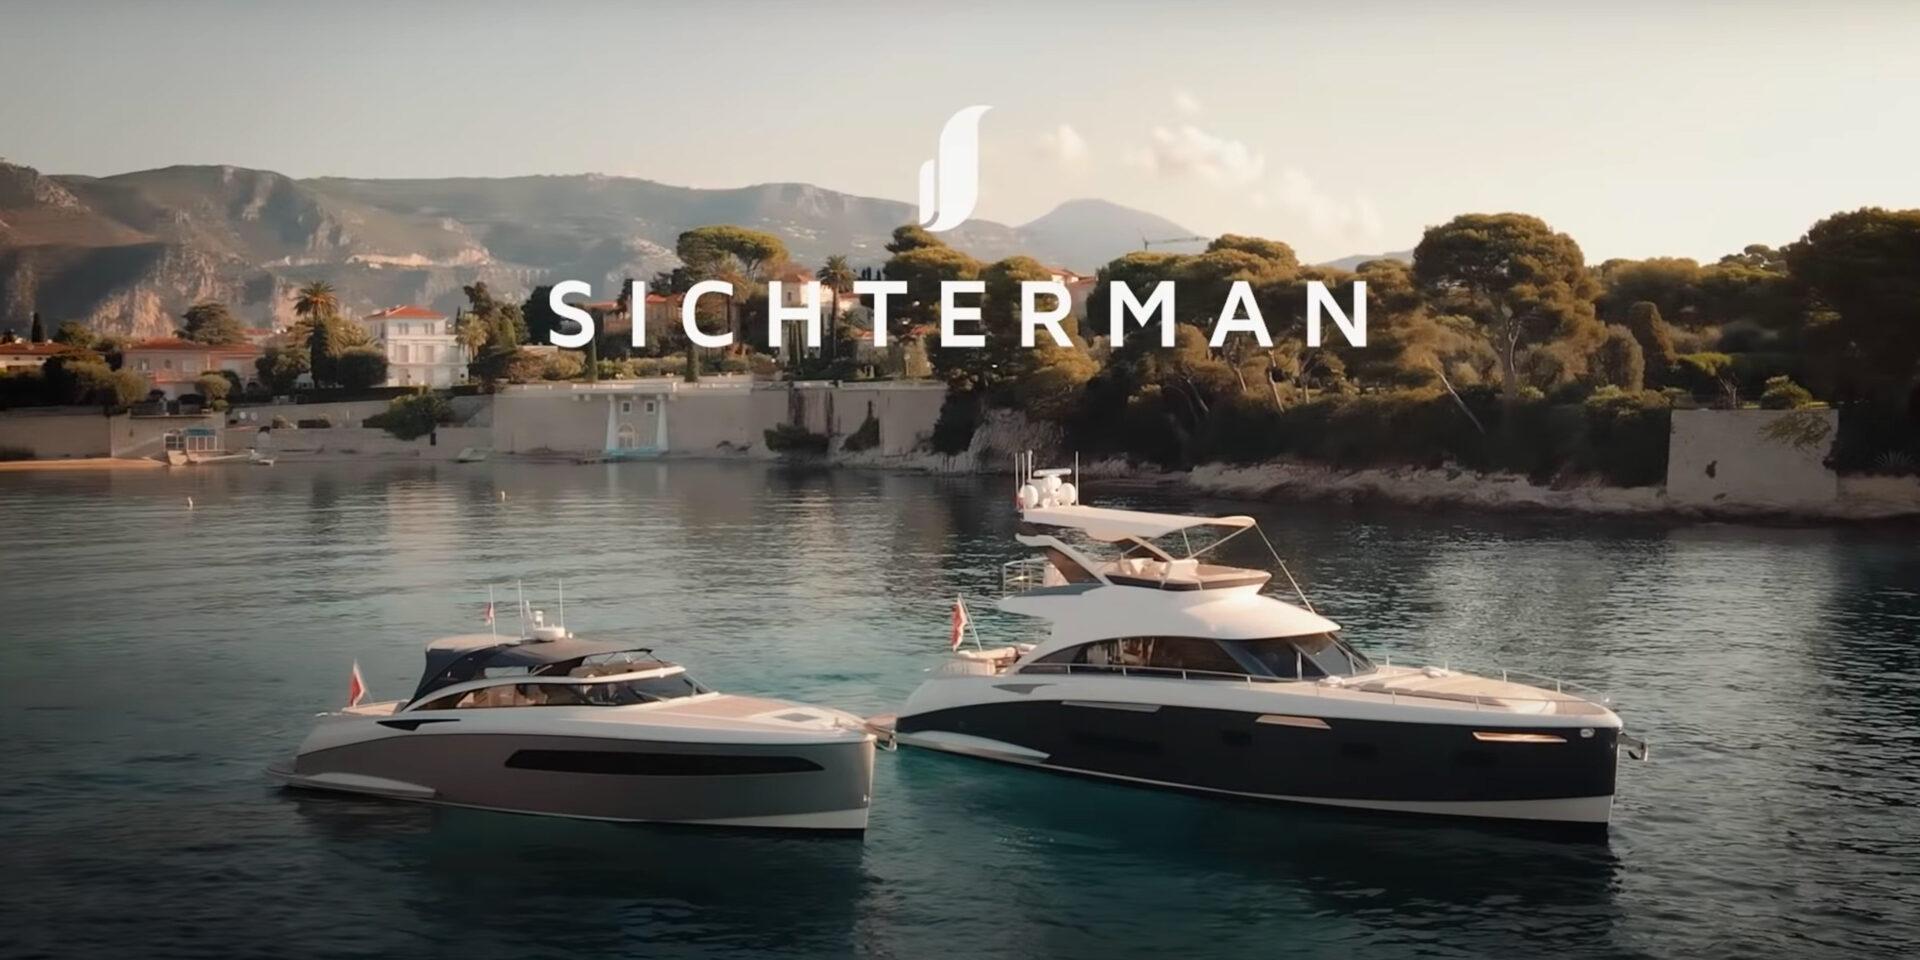 SICHTERMAN  YACHTS – SHORT DOCUMENTARY